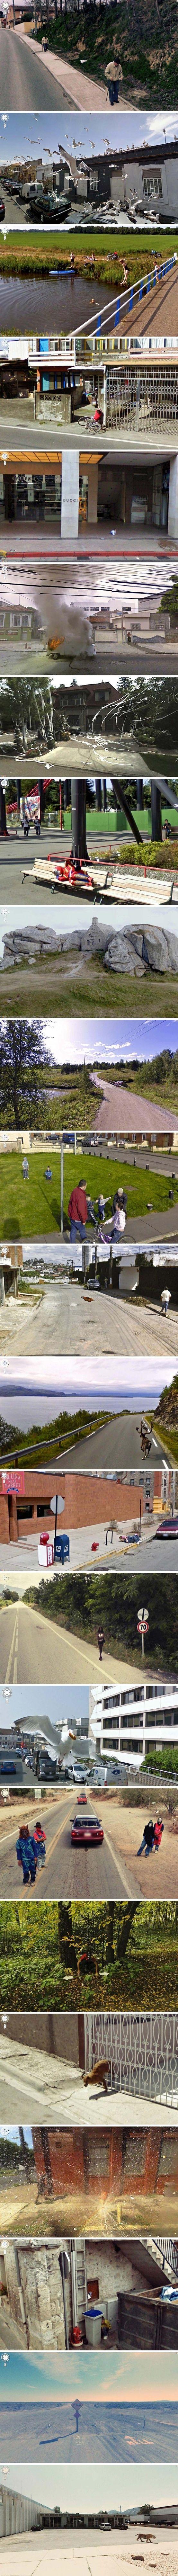 The Google Maps camera catches some EPIC stuff - Little White LionLittle White Lion